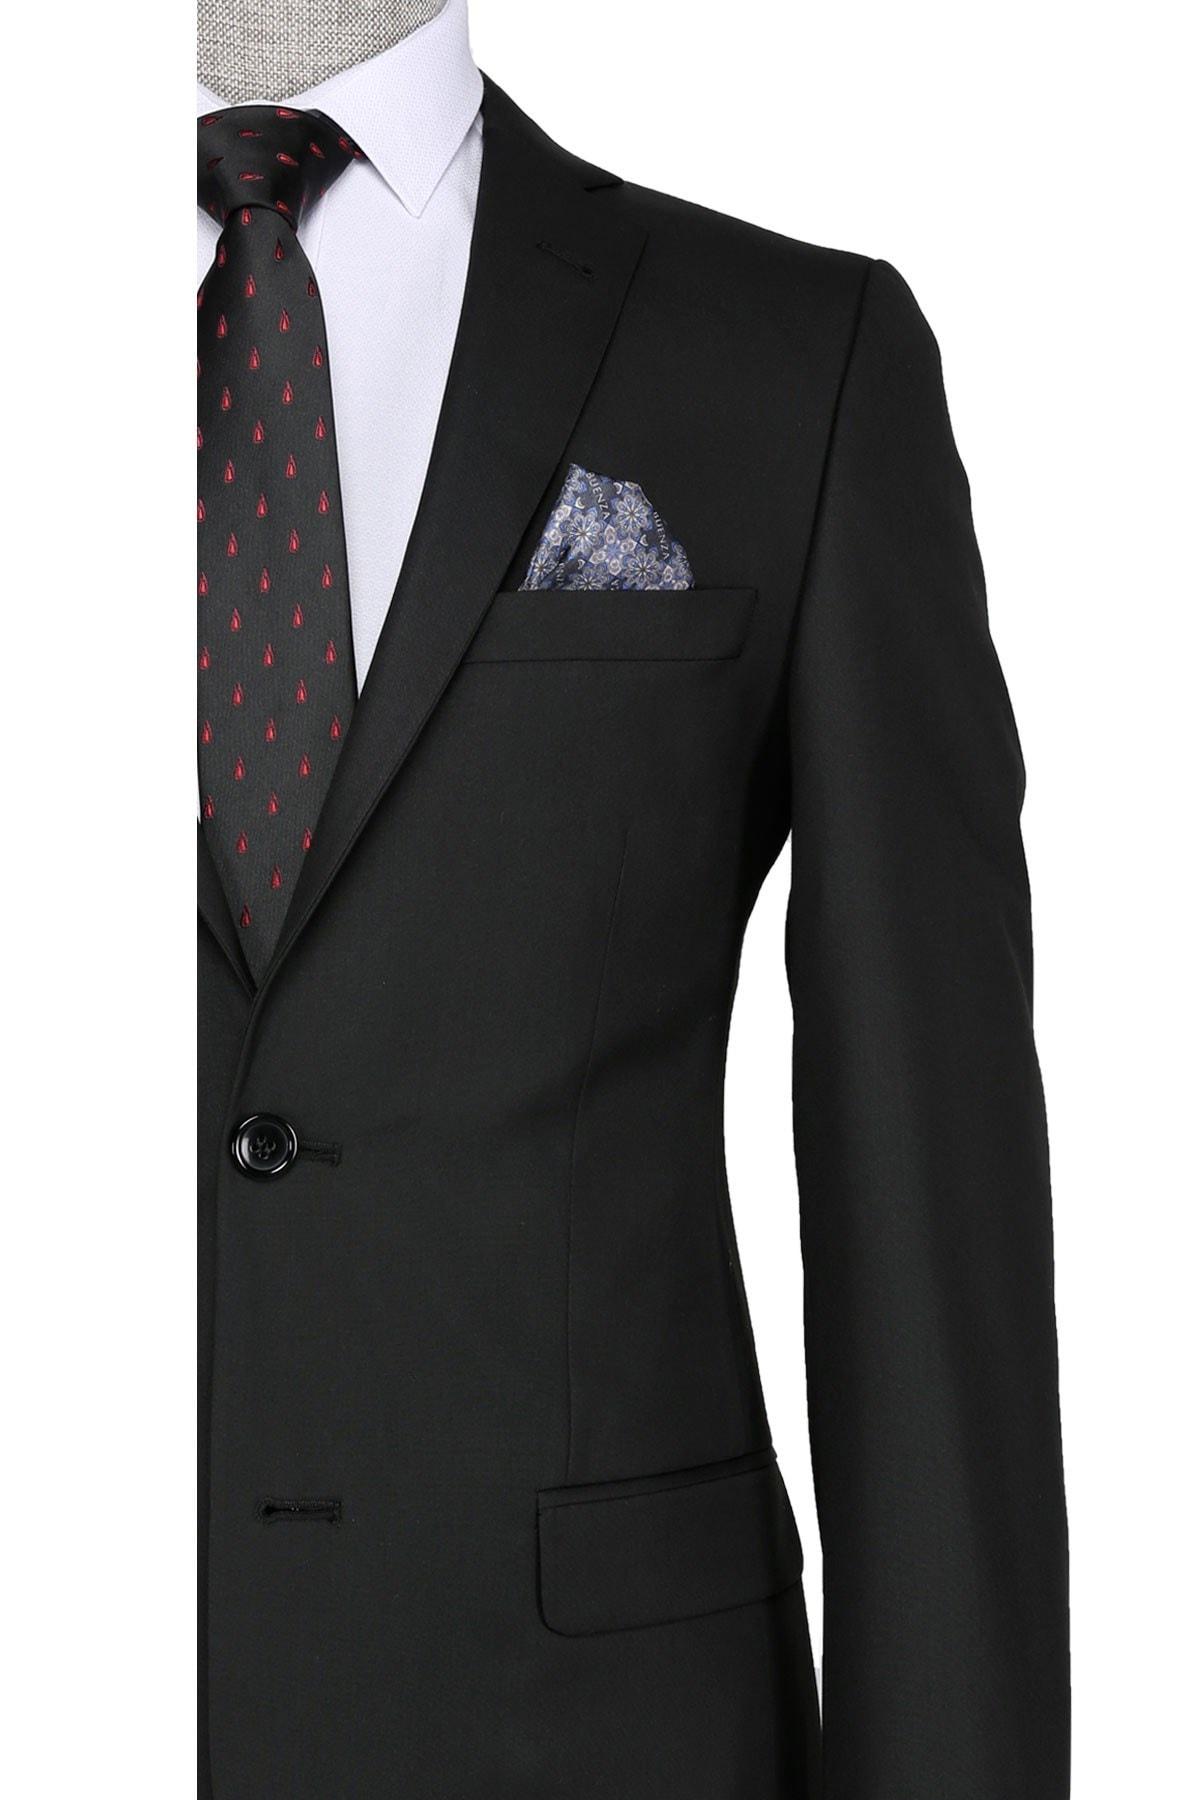 Buenza Slim fit Siyah Erkek Takım Elbise 1